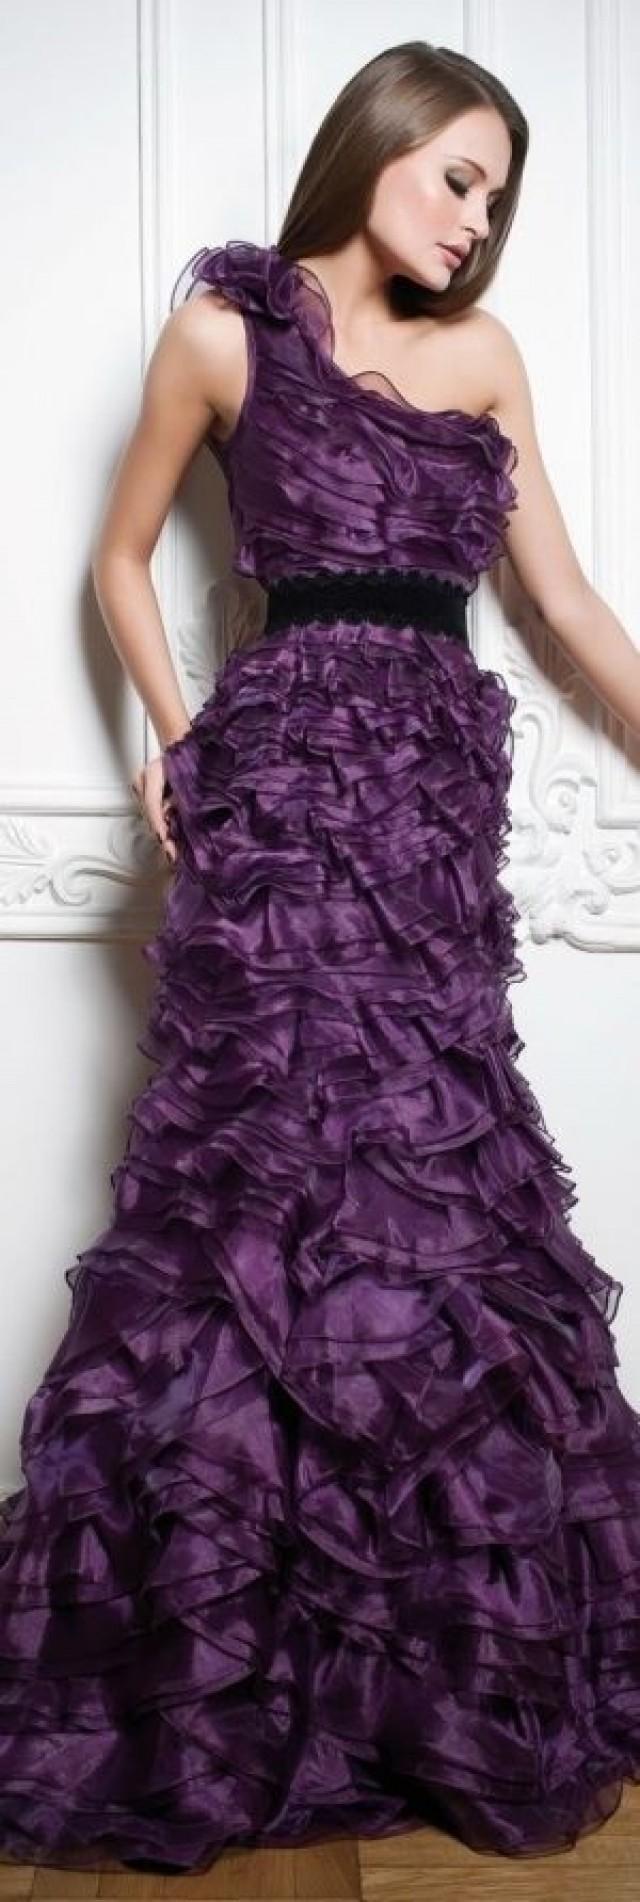 Gownspurple passions style pinterest purple wedding